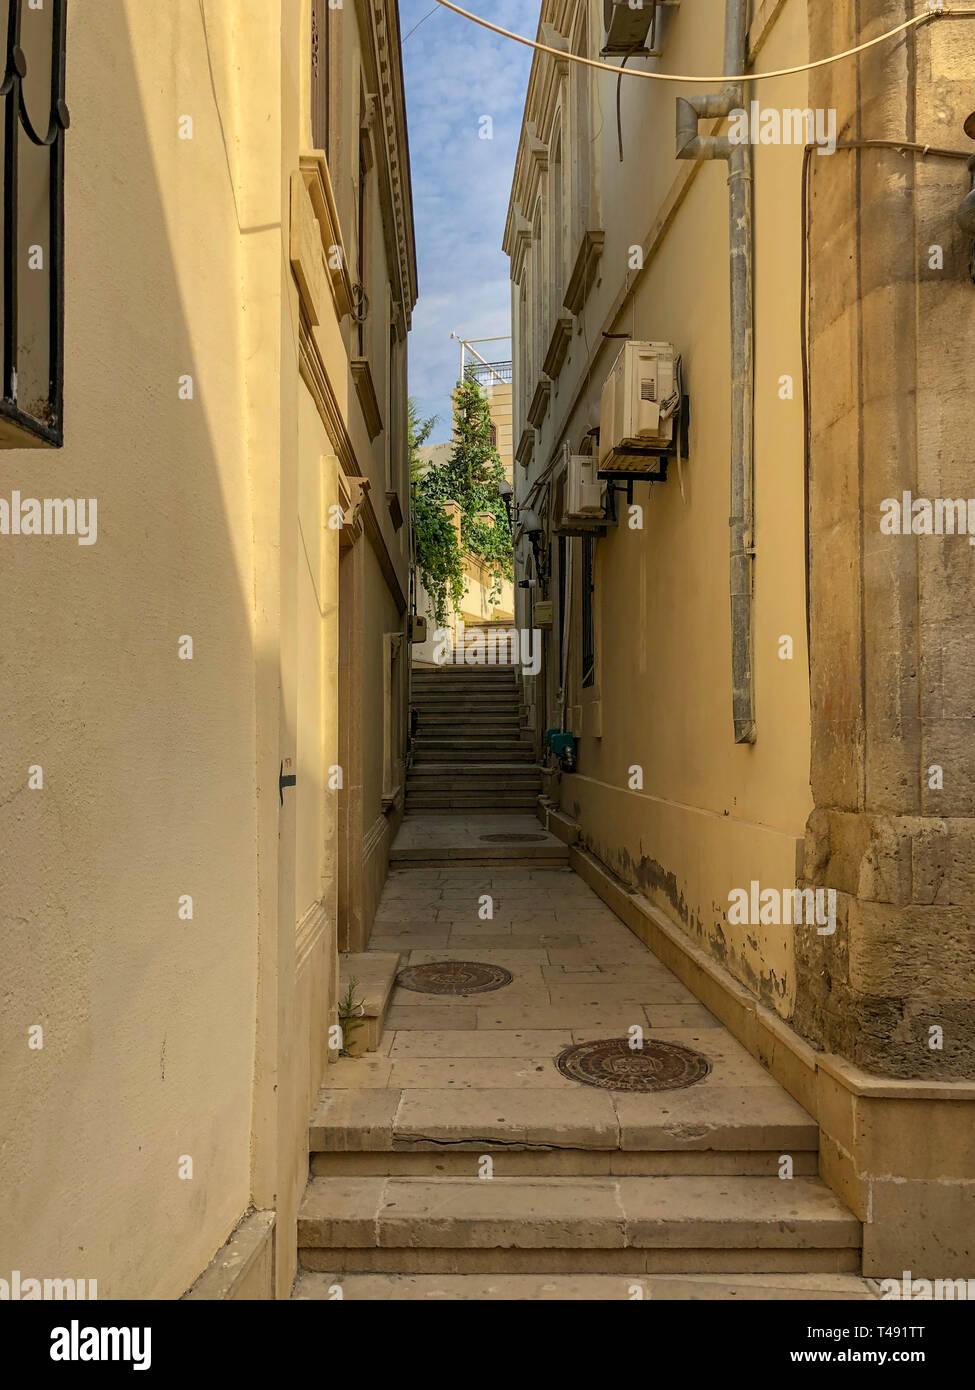 Narrow winding staircase in the old city of Baku, Azerbaijan. - Stock Image